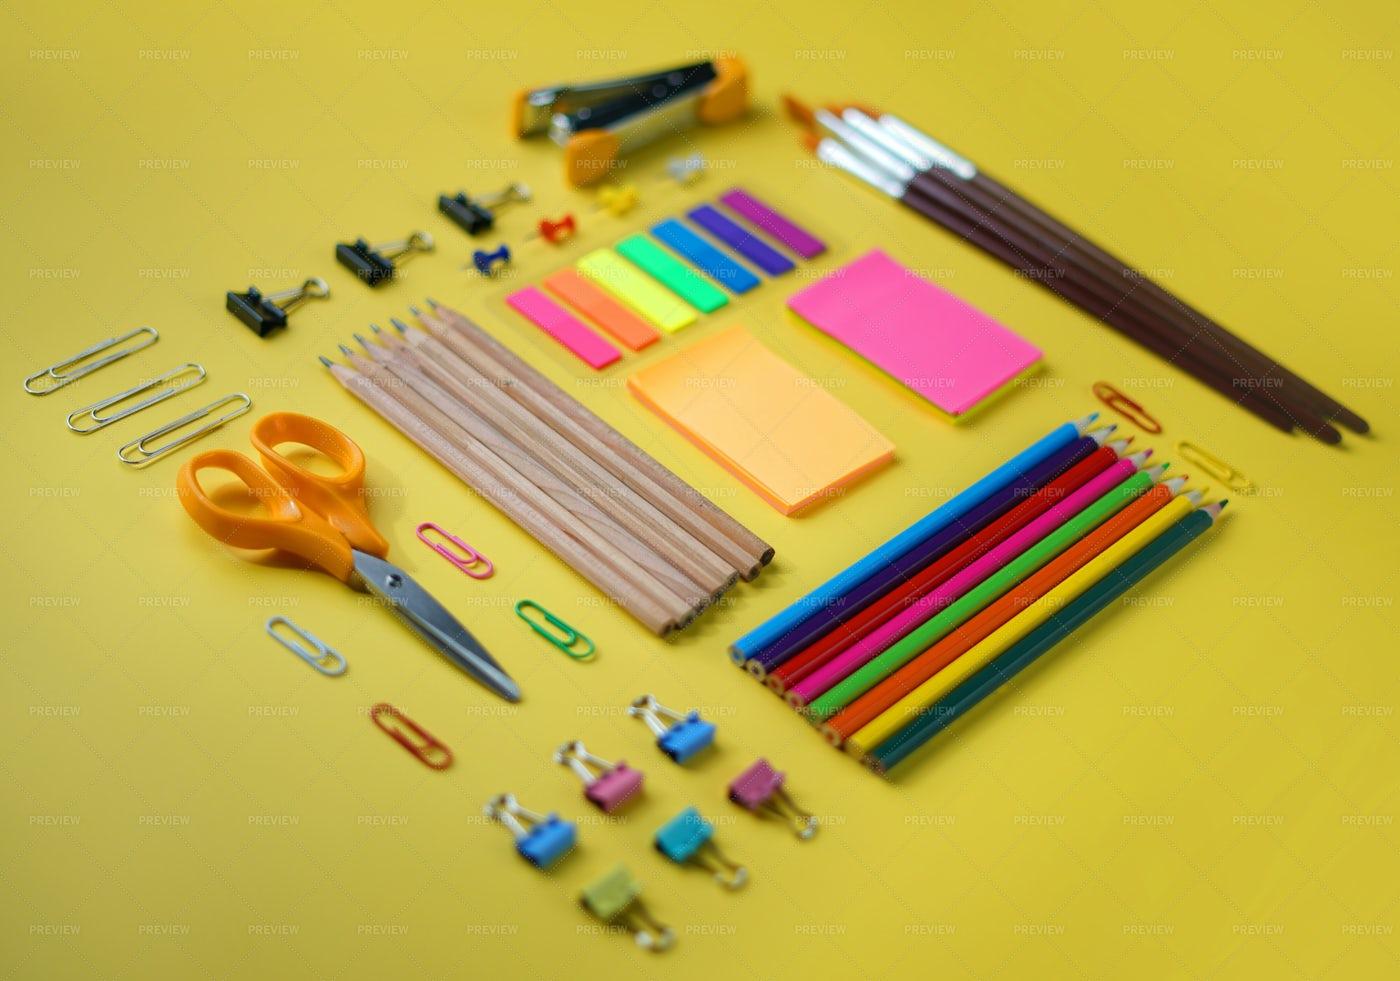 Neat Arrangement Of Supplies: Stock Photos